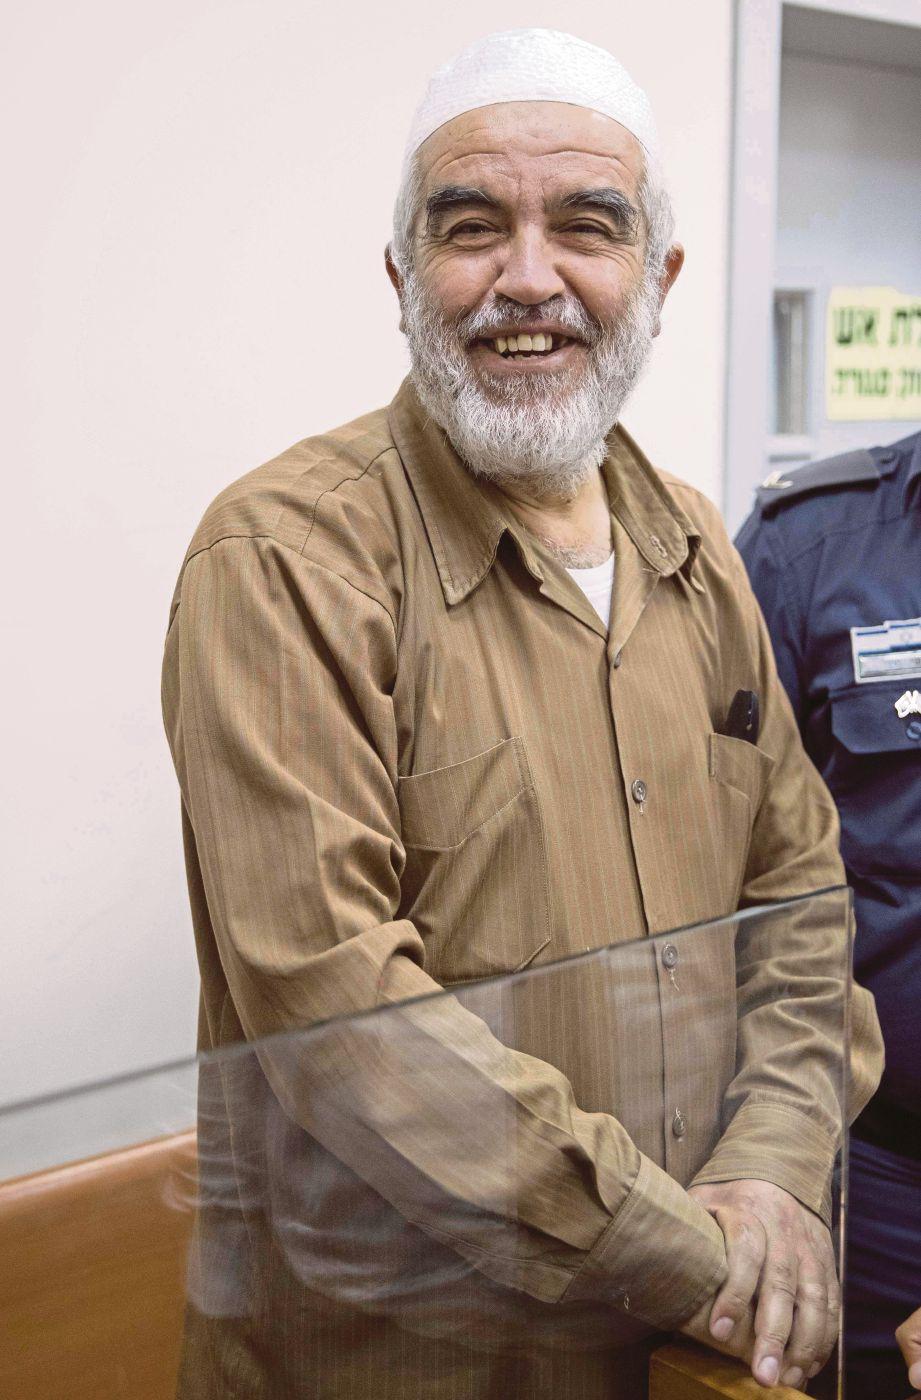 Seorang ulama dituduh menghasut keganasan di tapak suci Baitulmaqdis